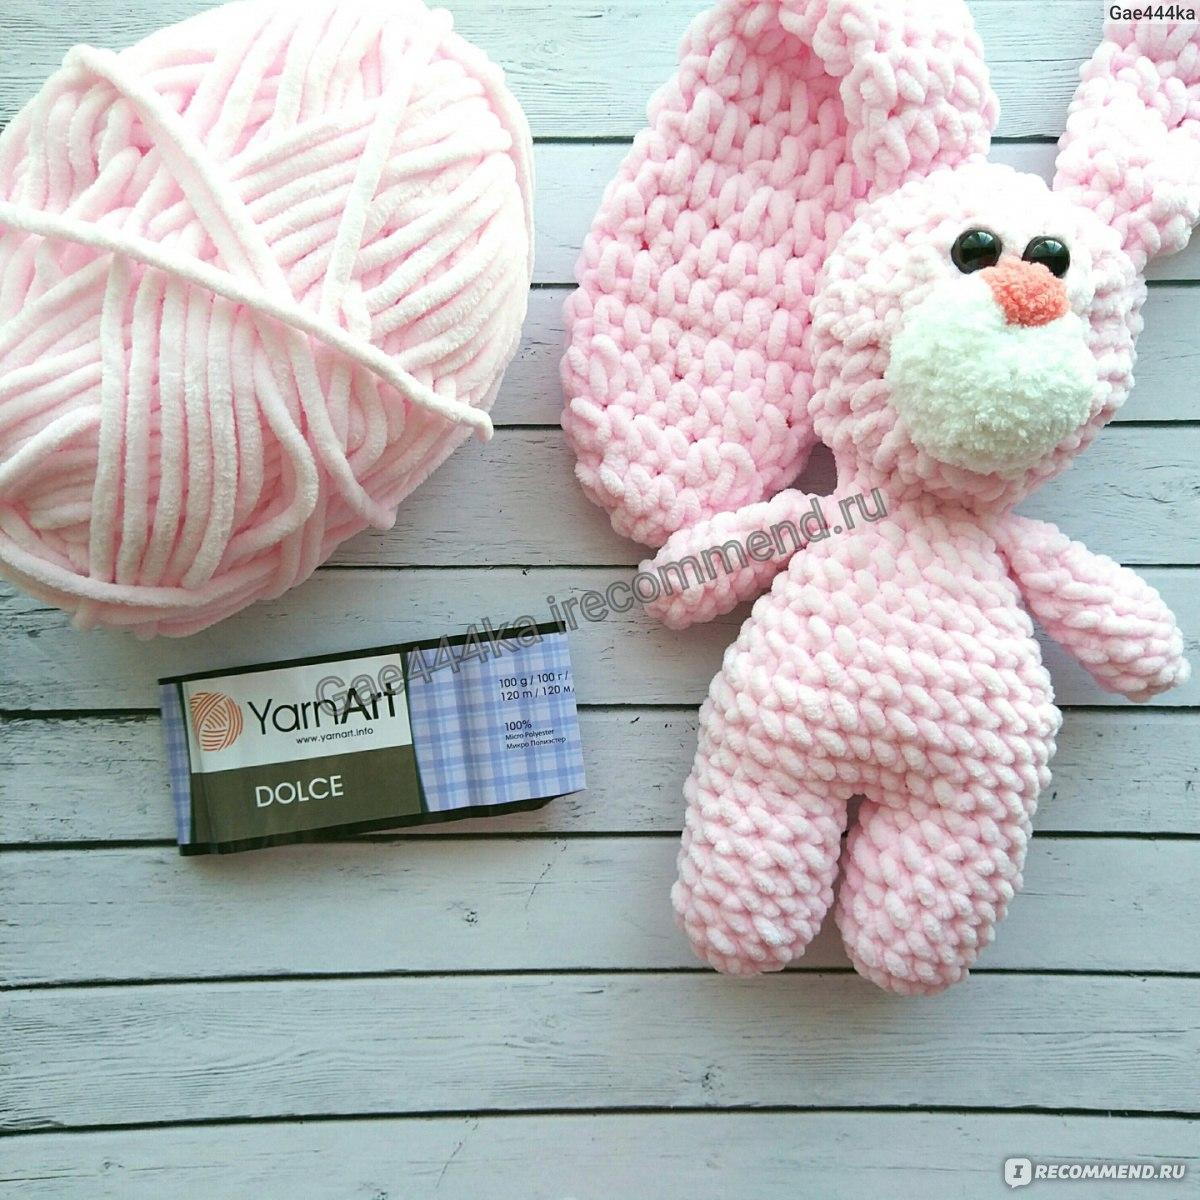 пряжа Yarnart Dolce прекрасная мягкая пряжа для вязания игрушек